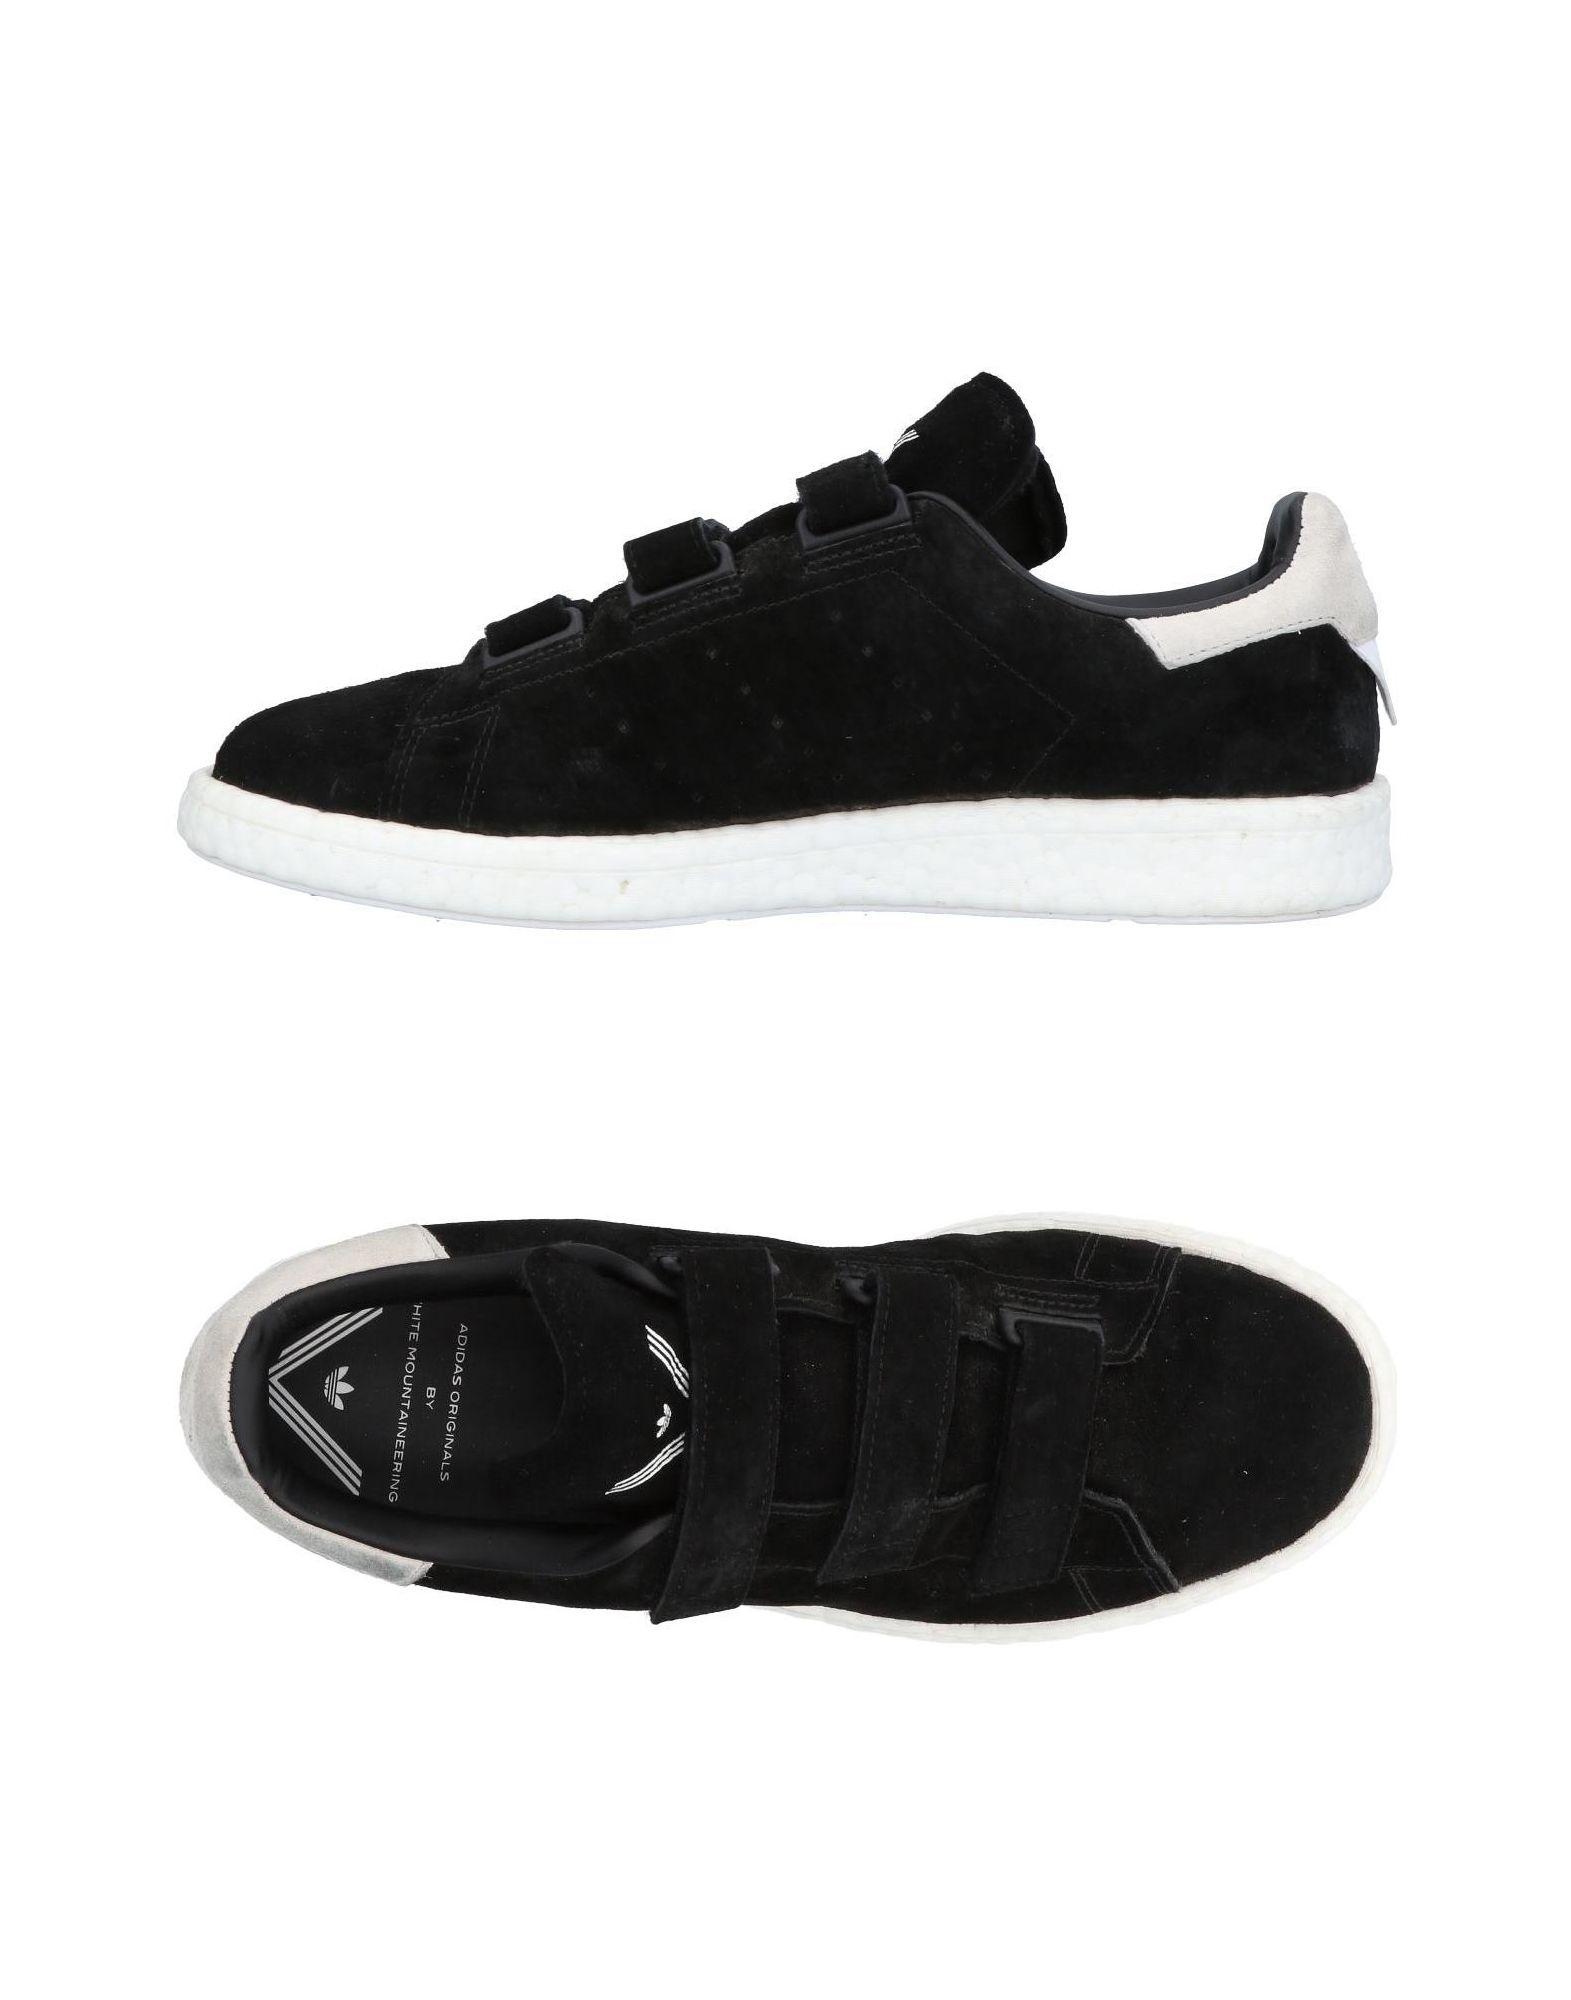 Sneakers Adidas Originals By White Mountaineering Uomo - 11469030KW